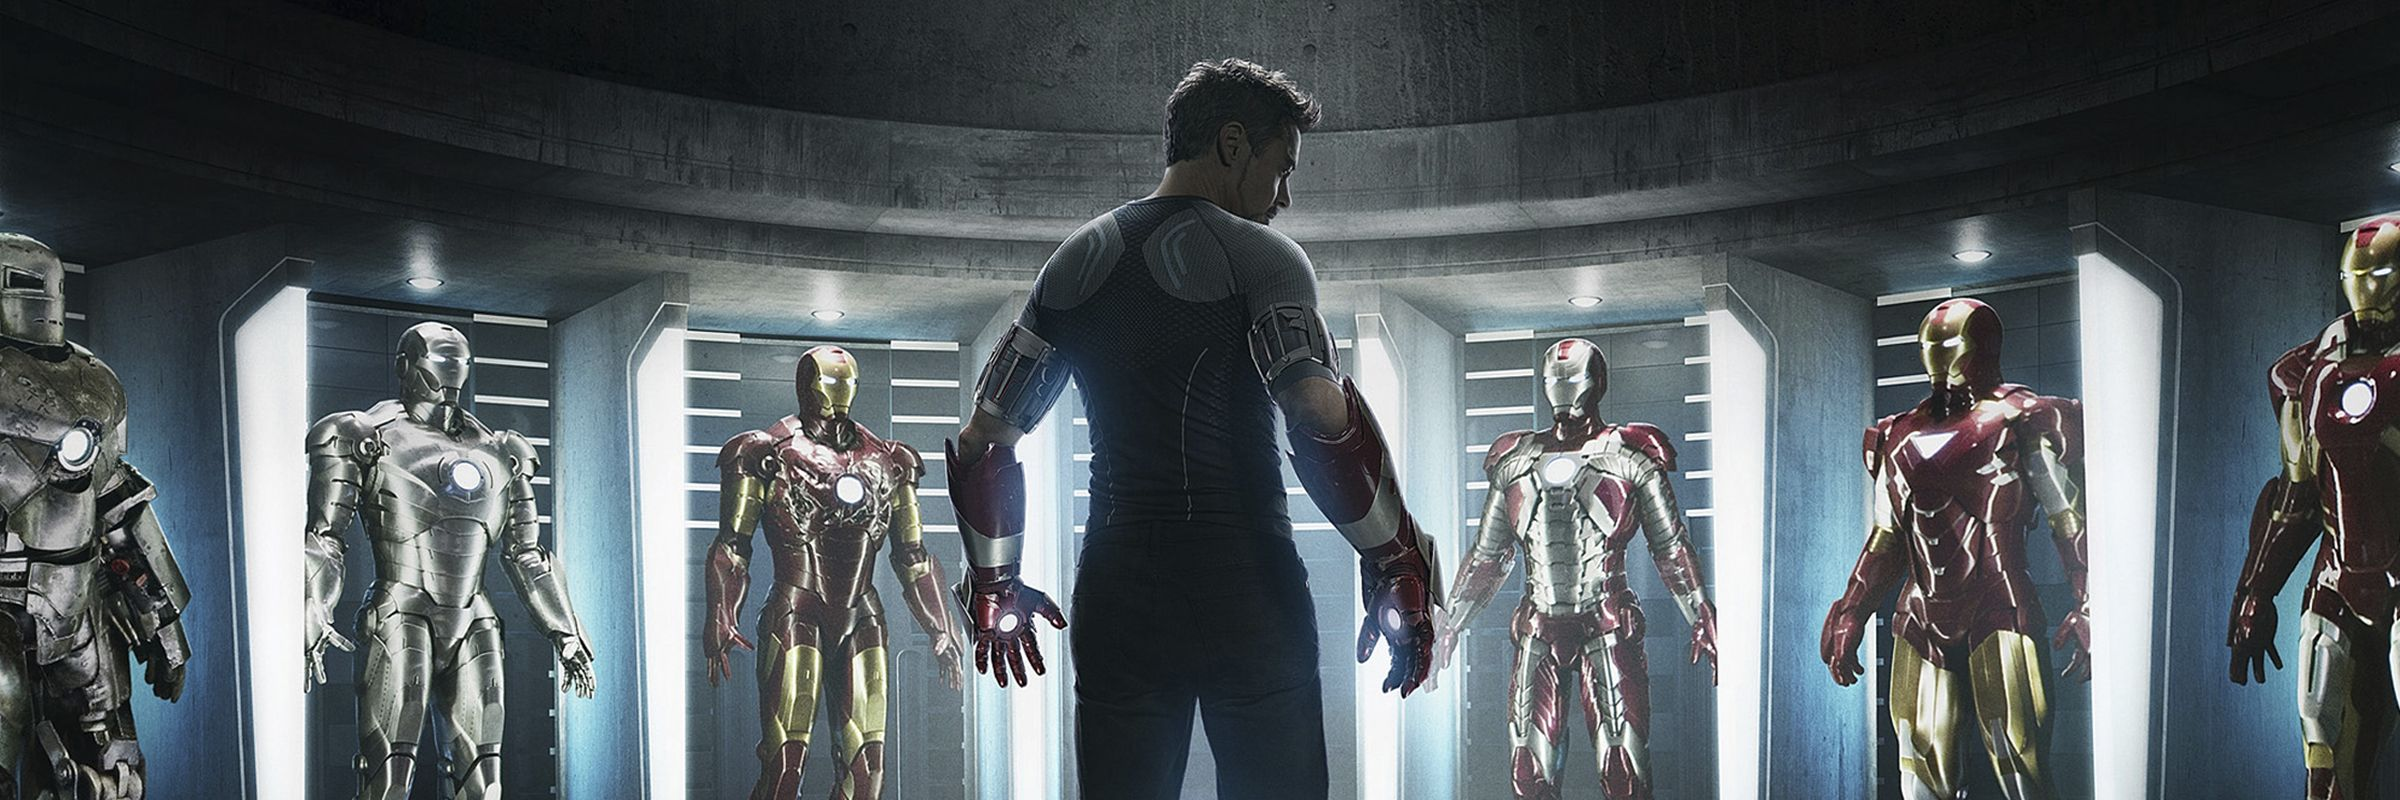 Marvel Studios' Iron Man 3   Full Movie   Movies Anywhere